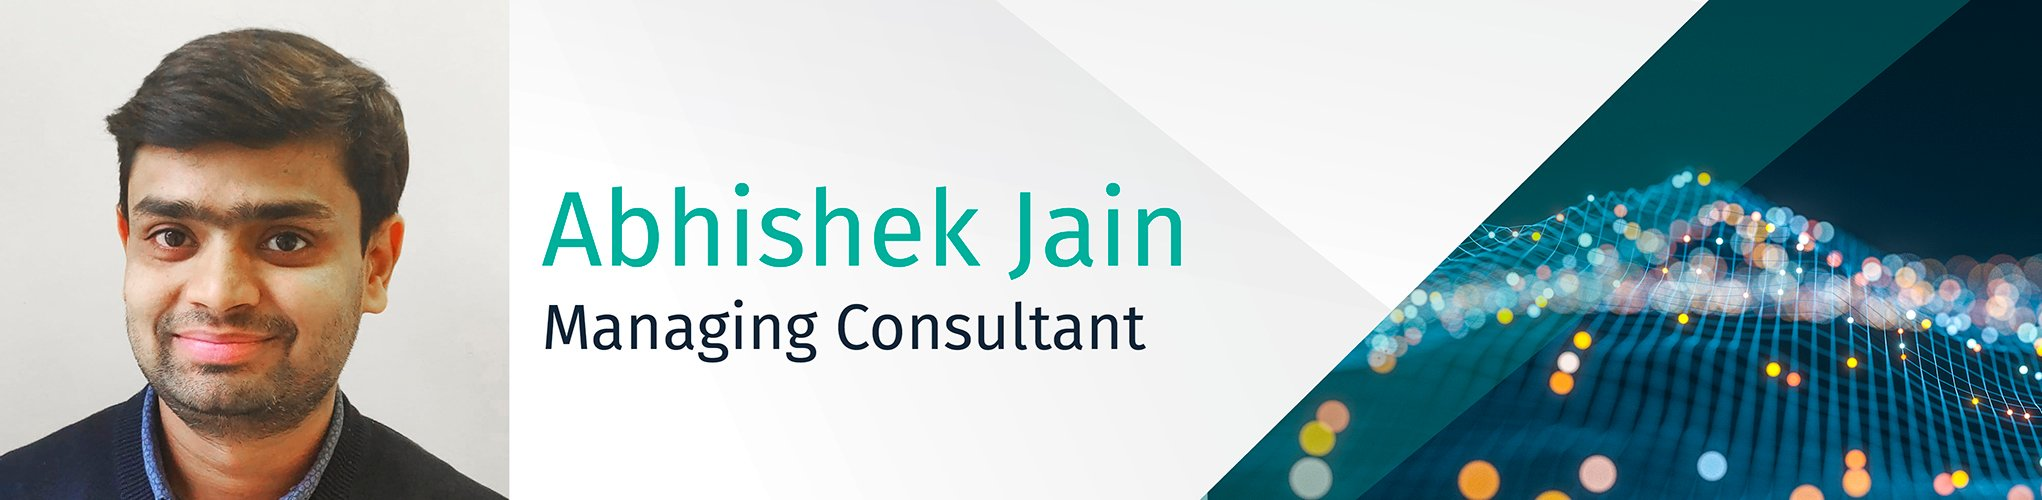 Meet-the-data-scientist_Profile-Box-Abhishek-Jain_2020-02-24